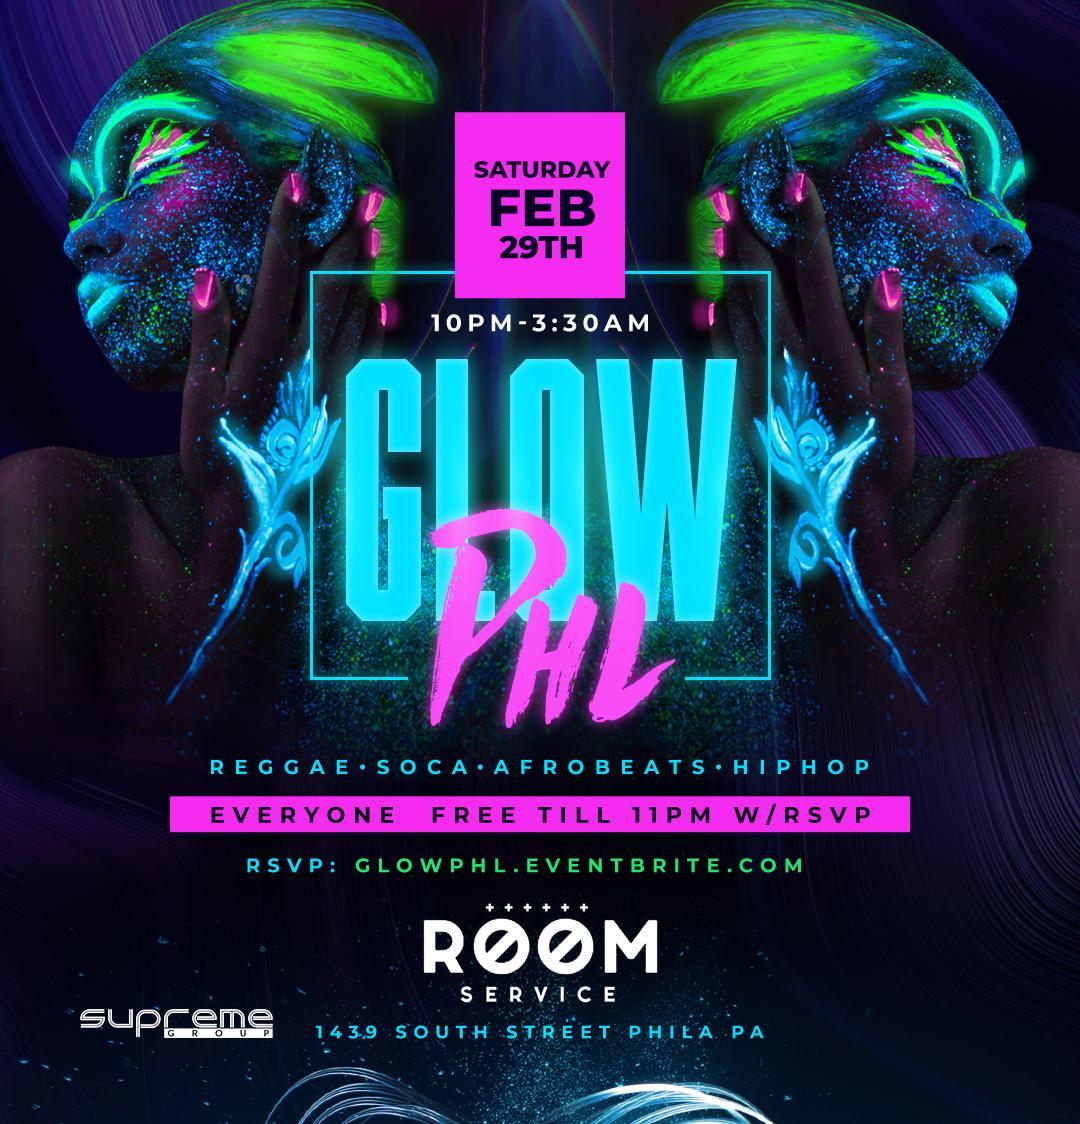 #GlowPHL Saturday February 29th 10pm-3:30am FREE til 11pm w/RSVP